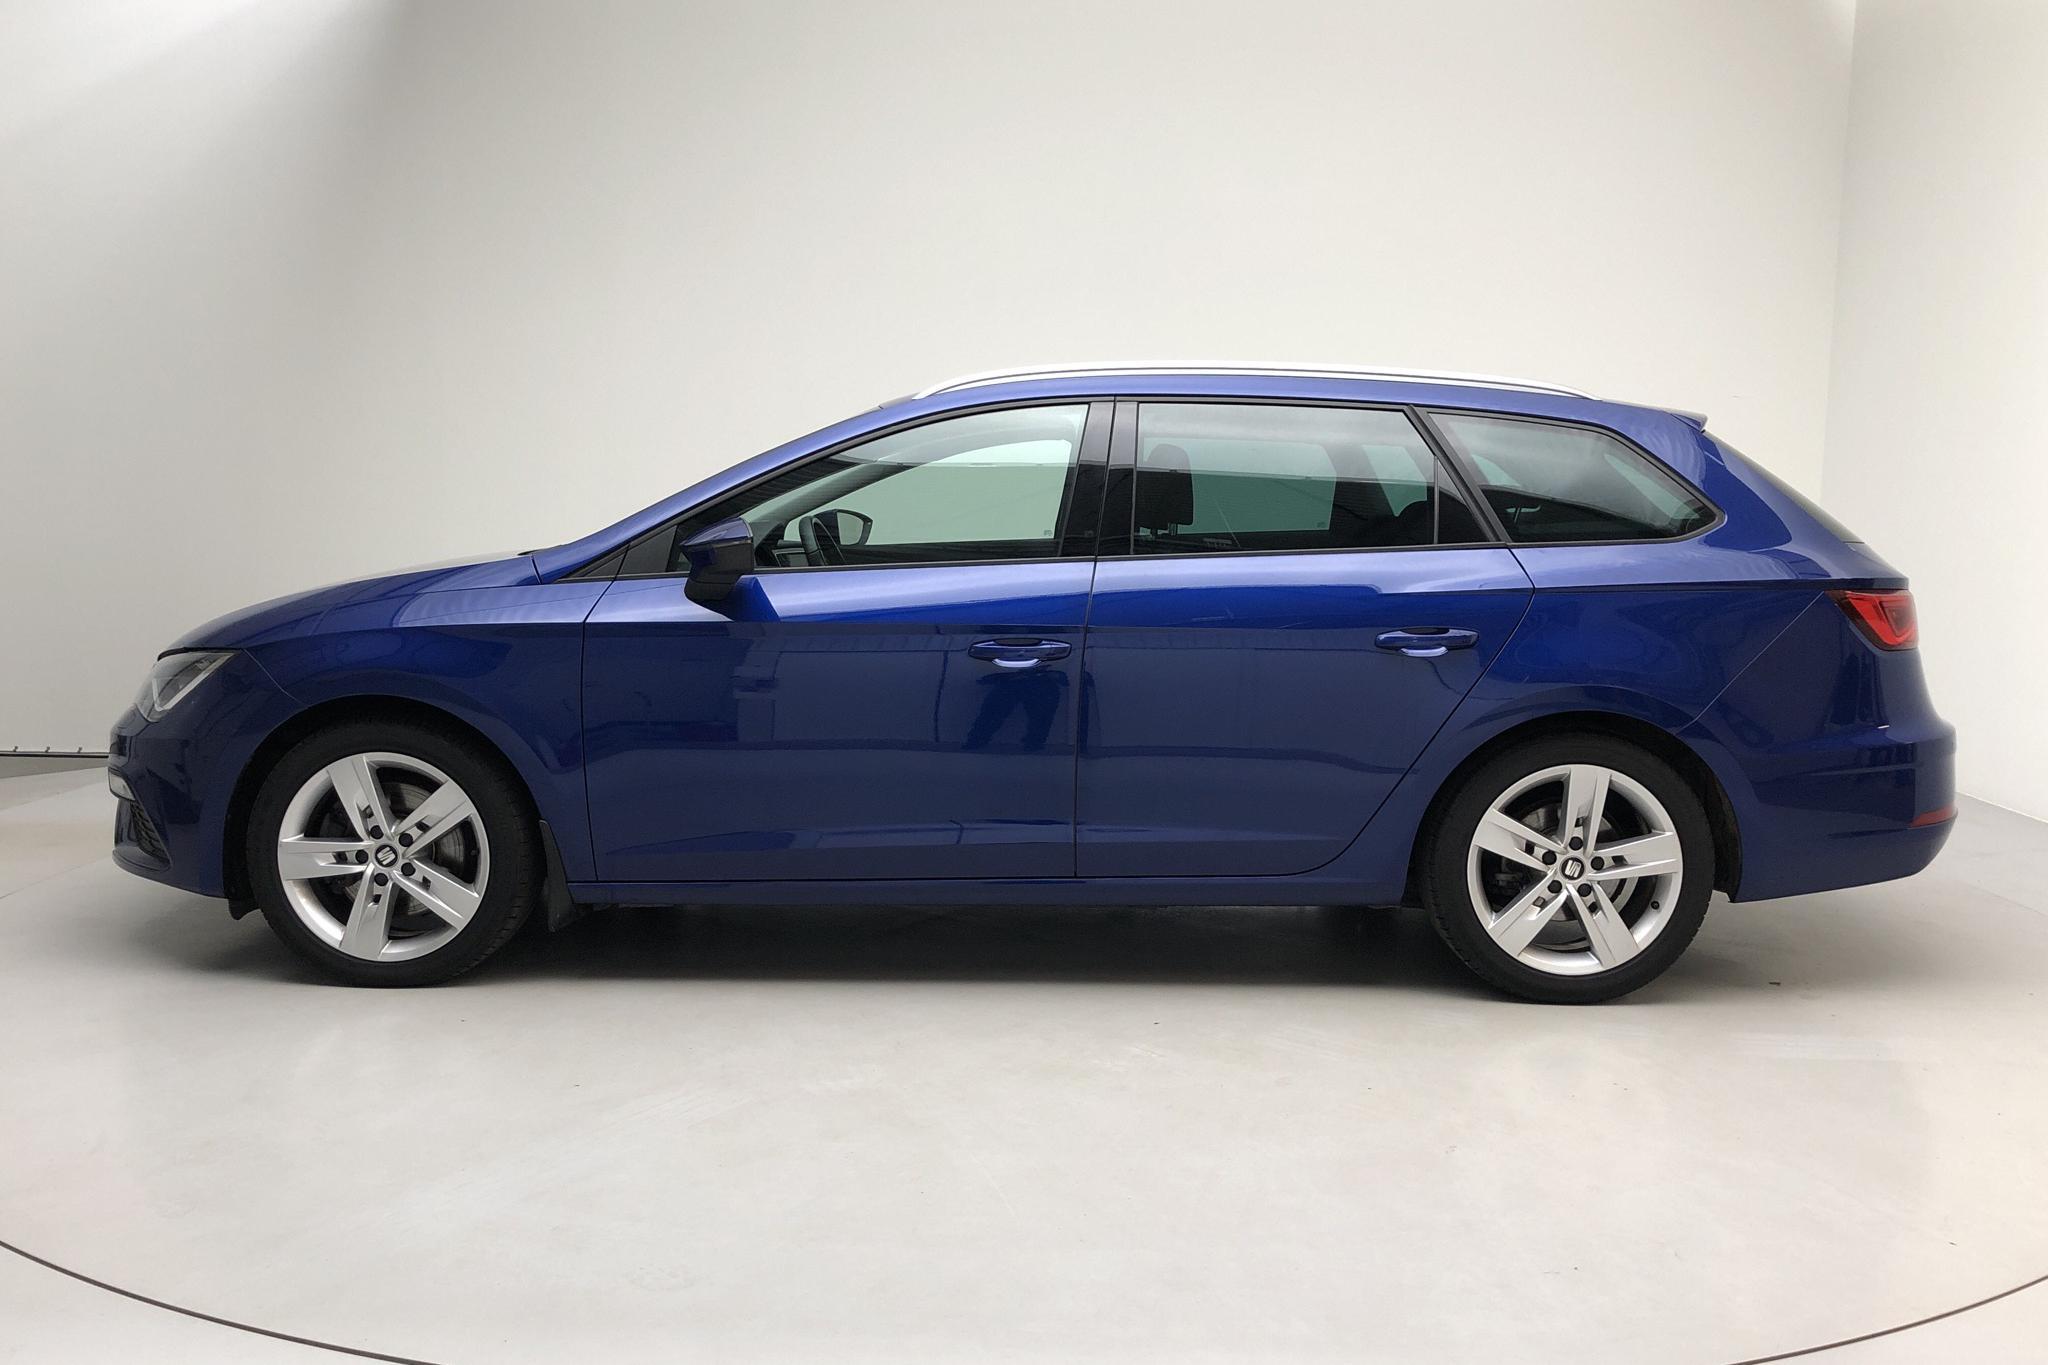 Seat Leon 2.0 TSI ST (190hk) - 29 310 km - Automatic - blue - 2019